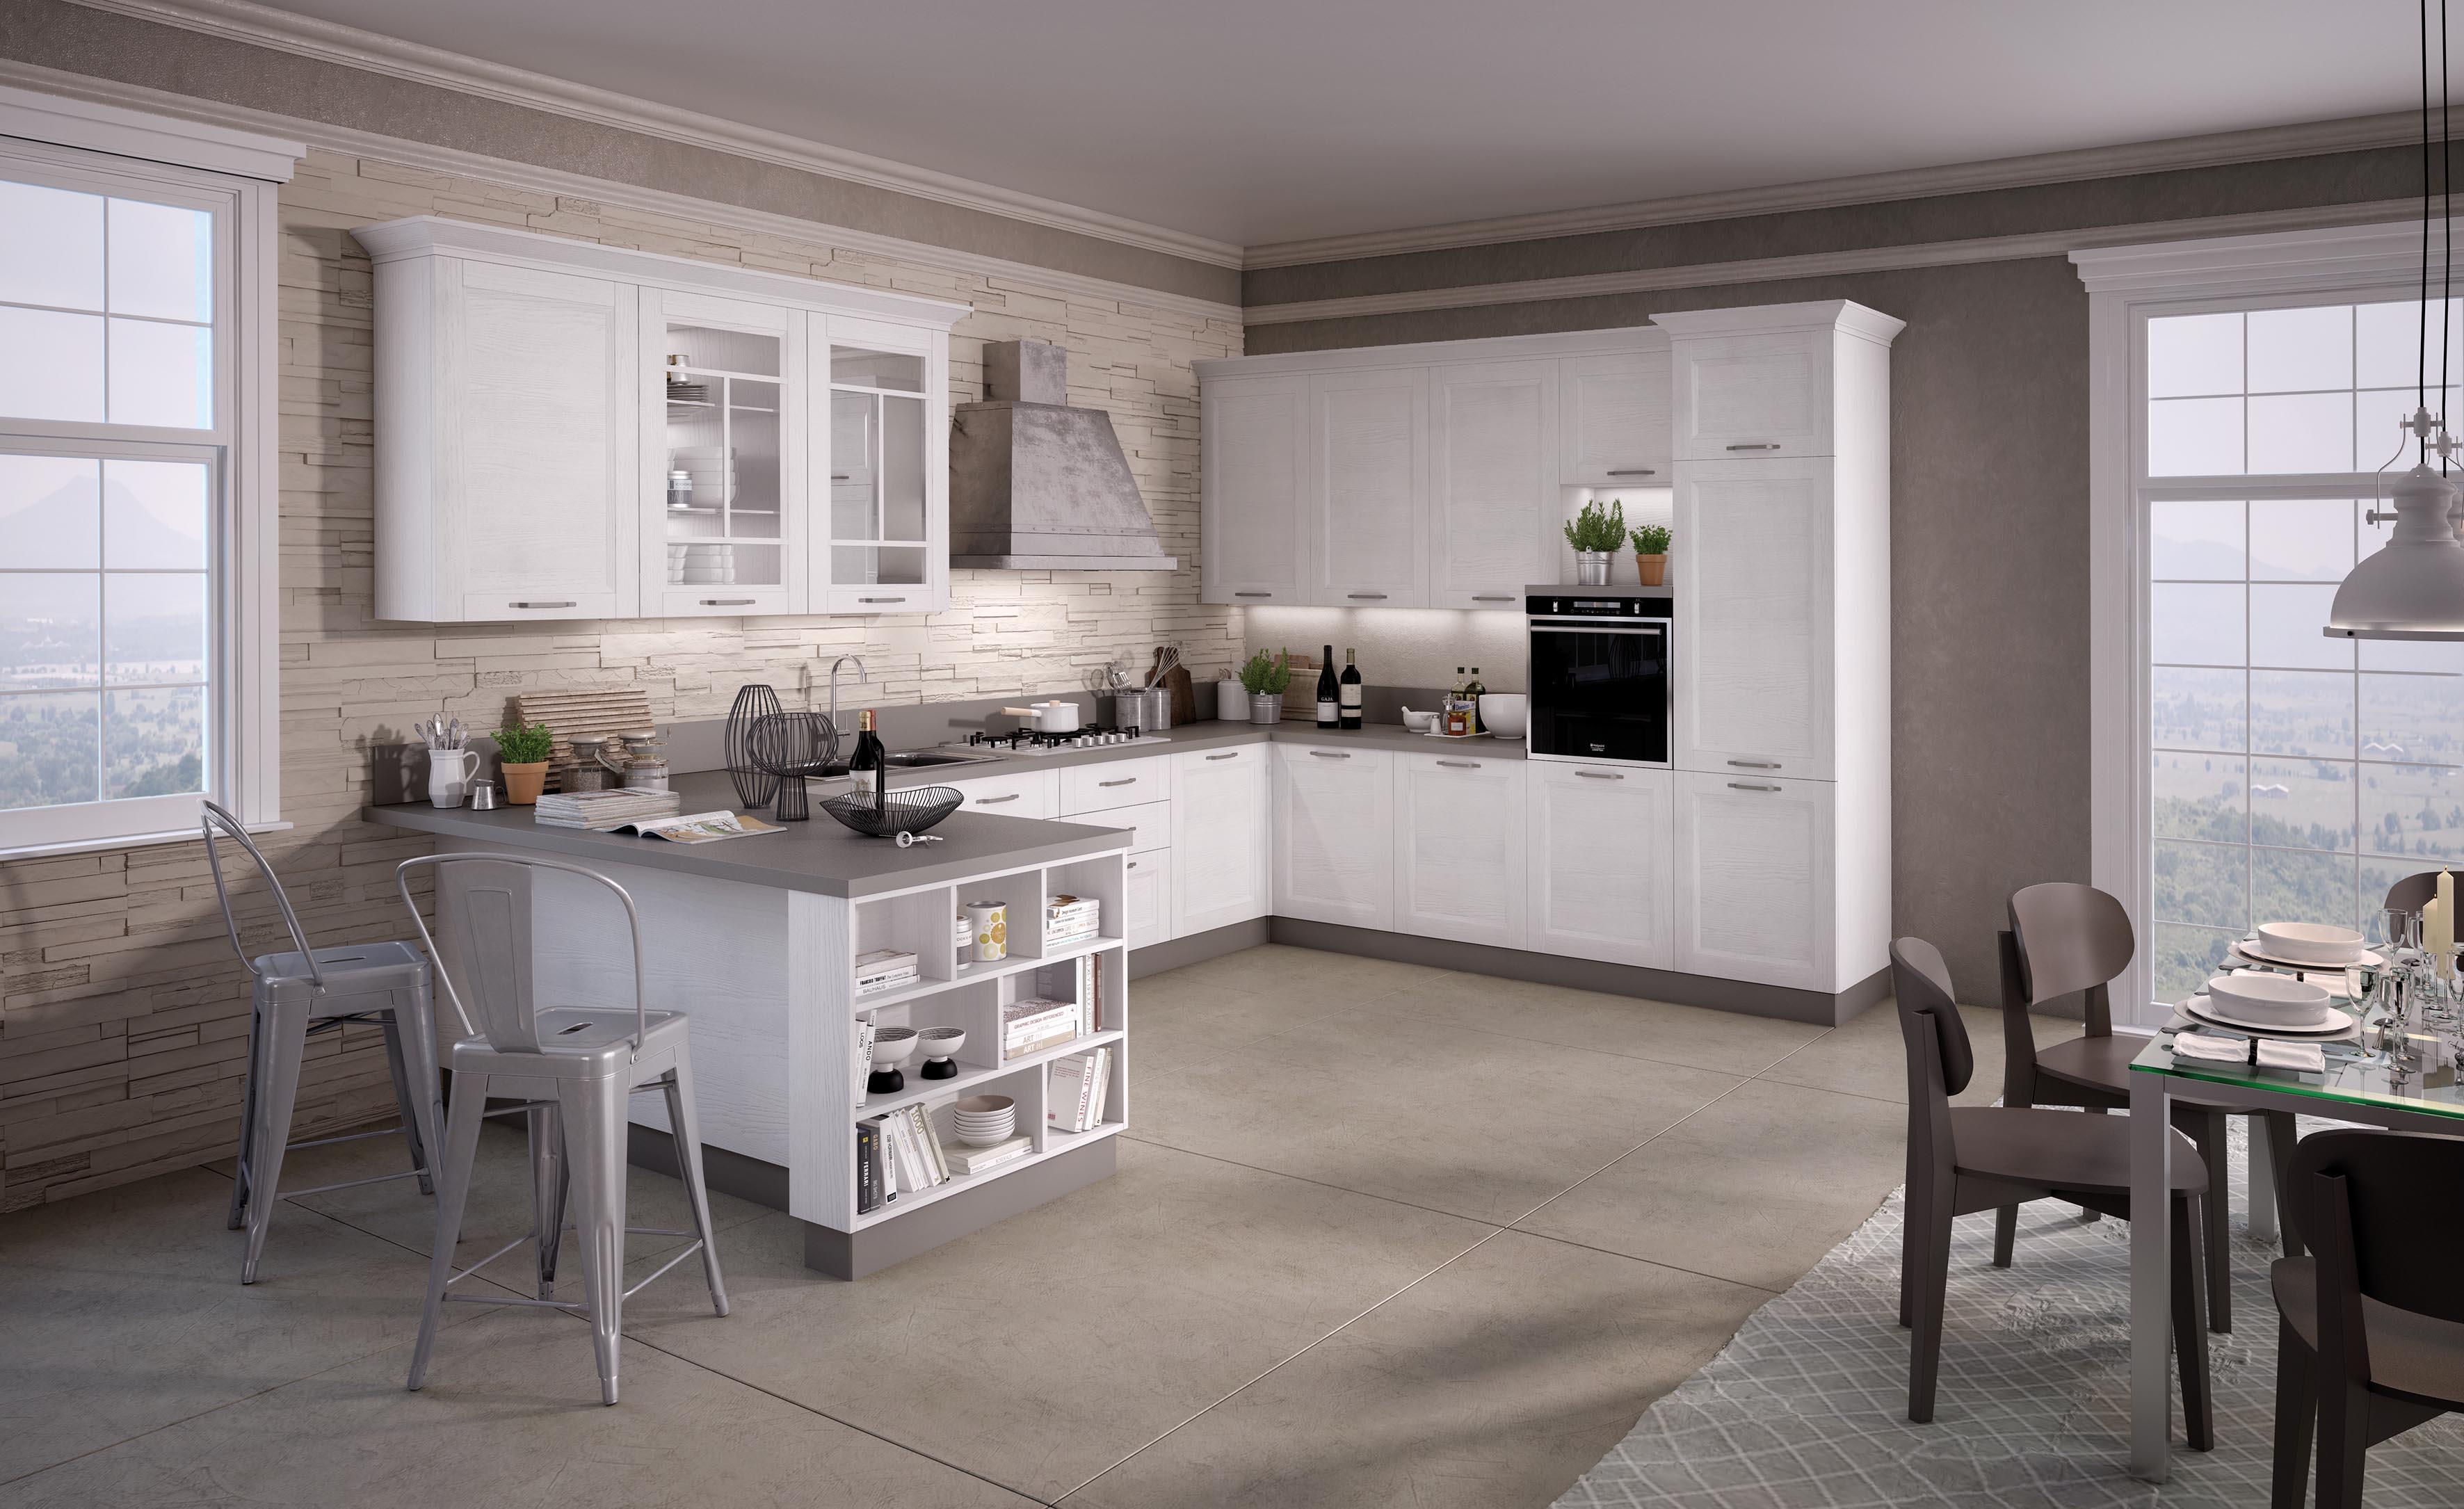 Mobili Per La Cucina: La cucina nellu armadio cose di casa.